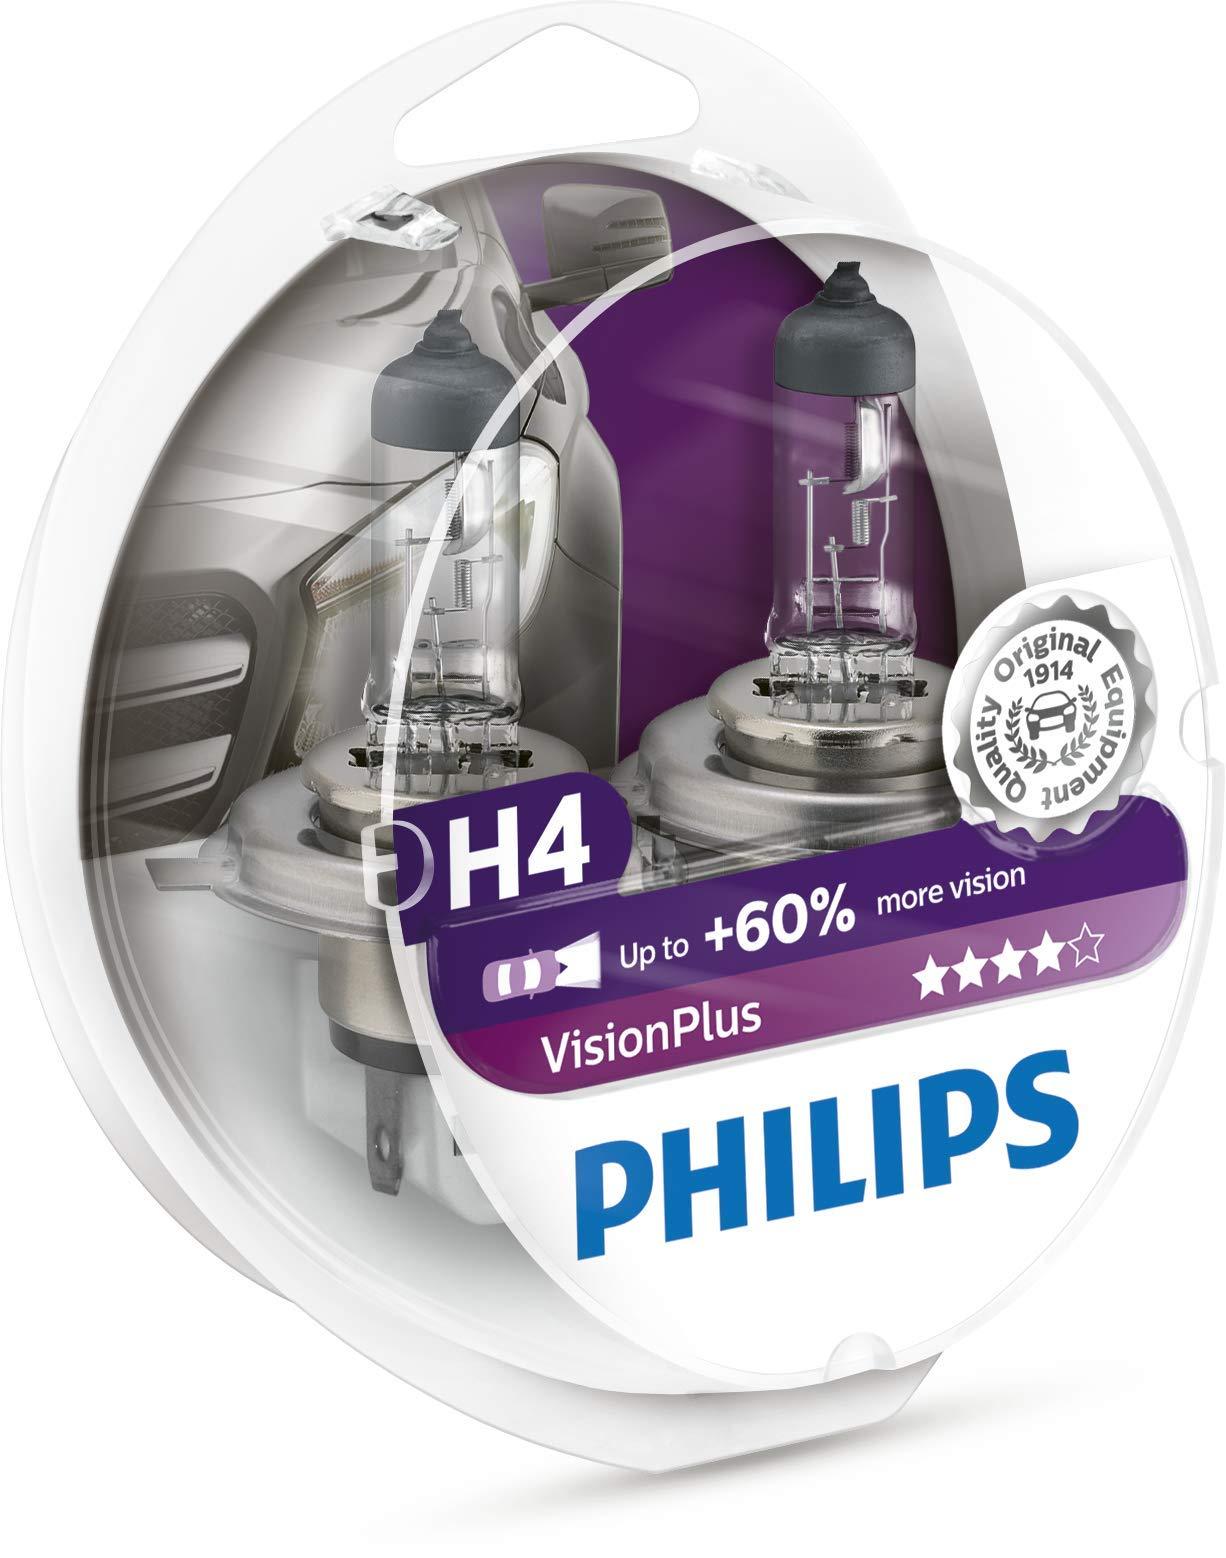 Philips 12342VPS2 VisionPlus - Bombillas H4 para faros delanteros (2 unidades) product image